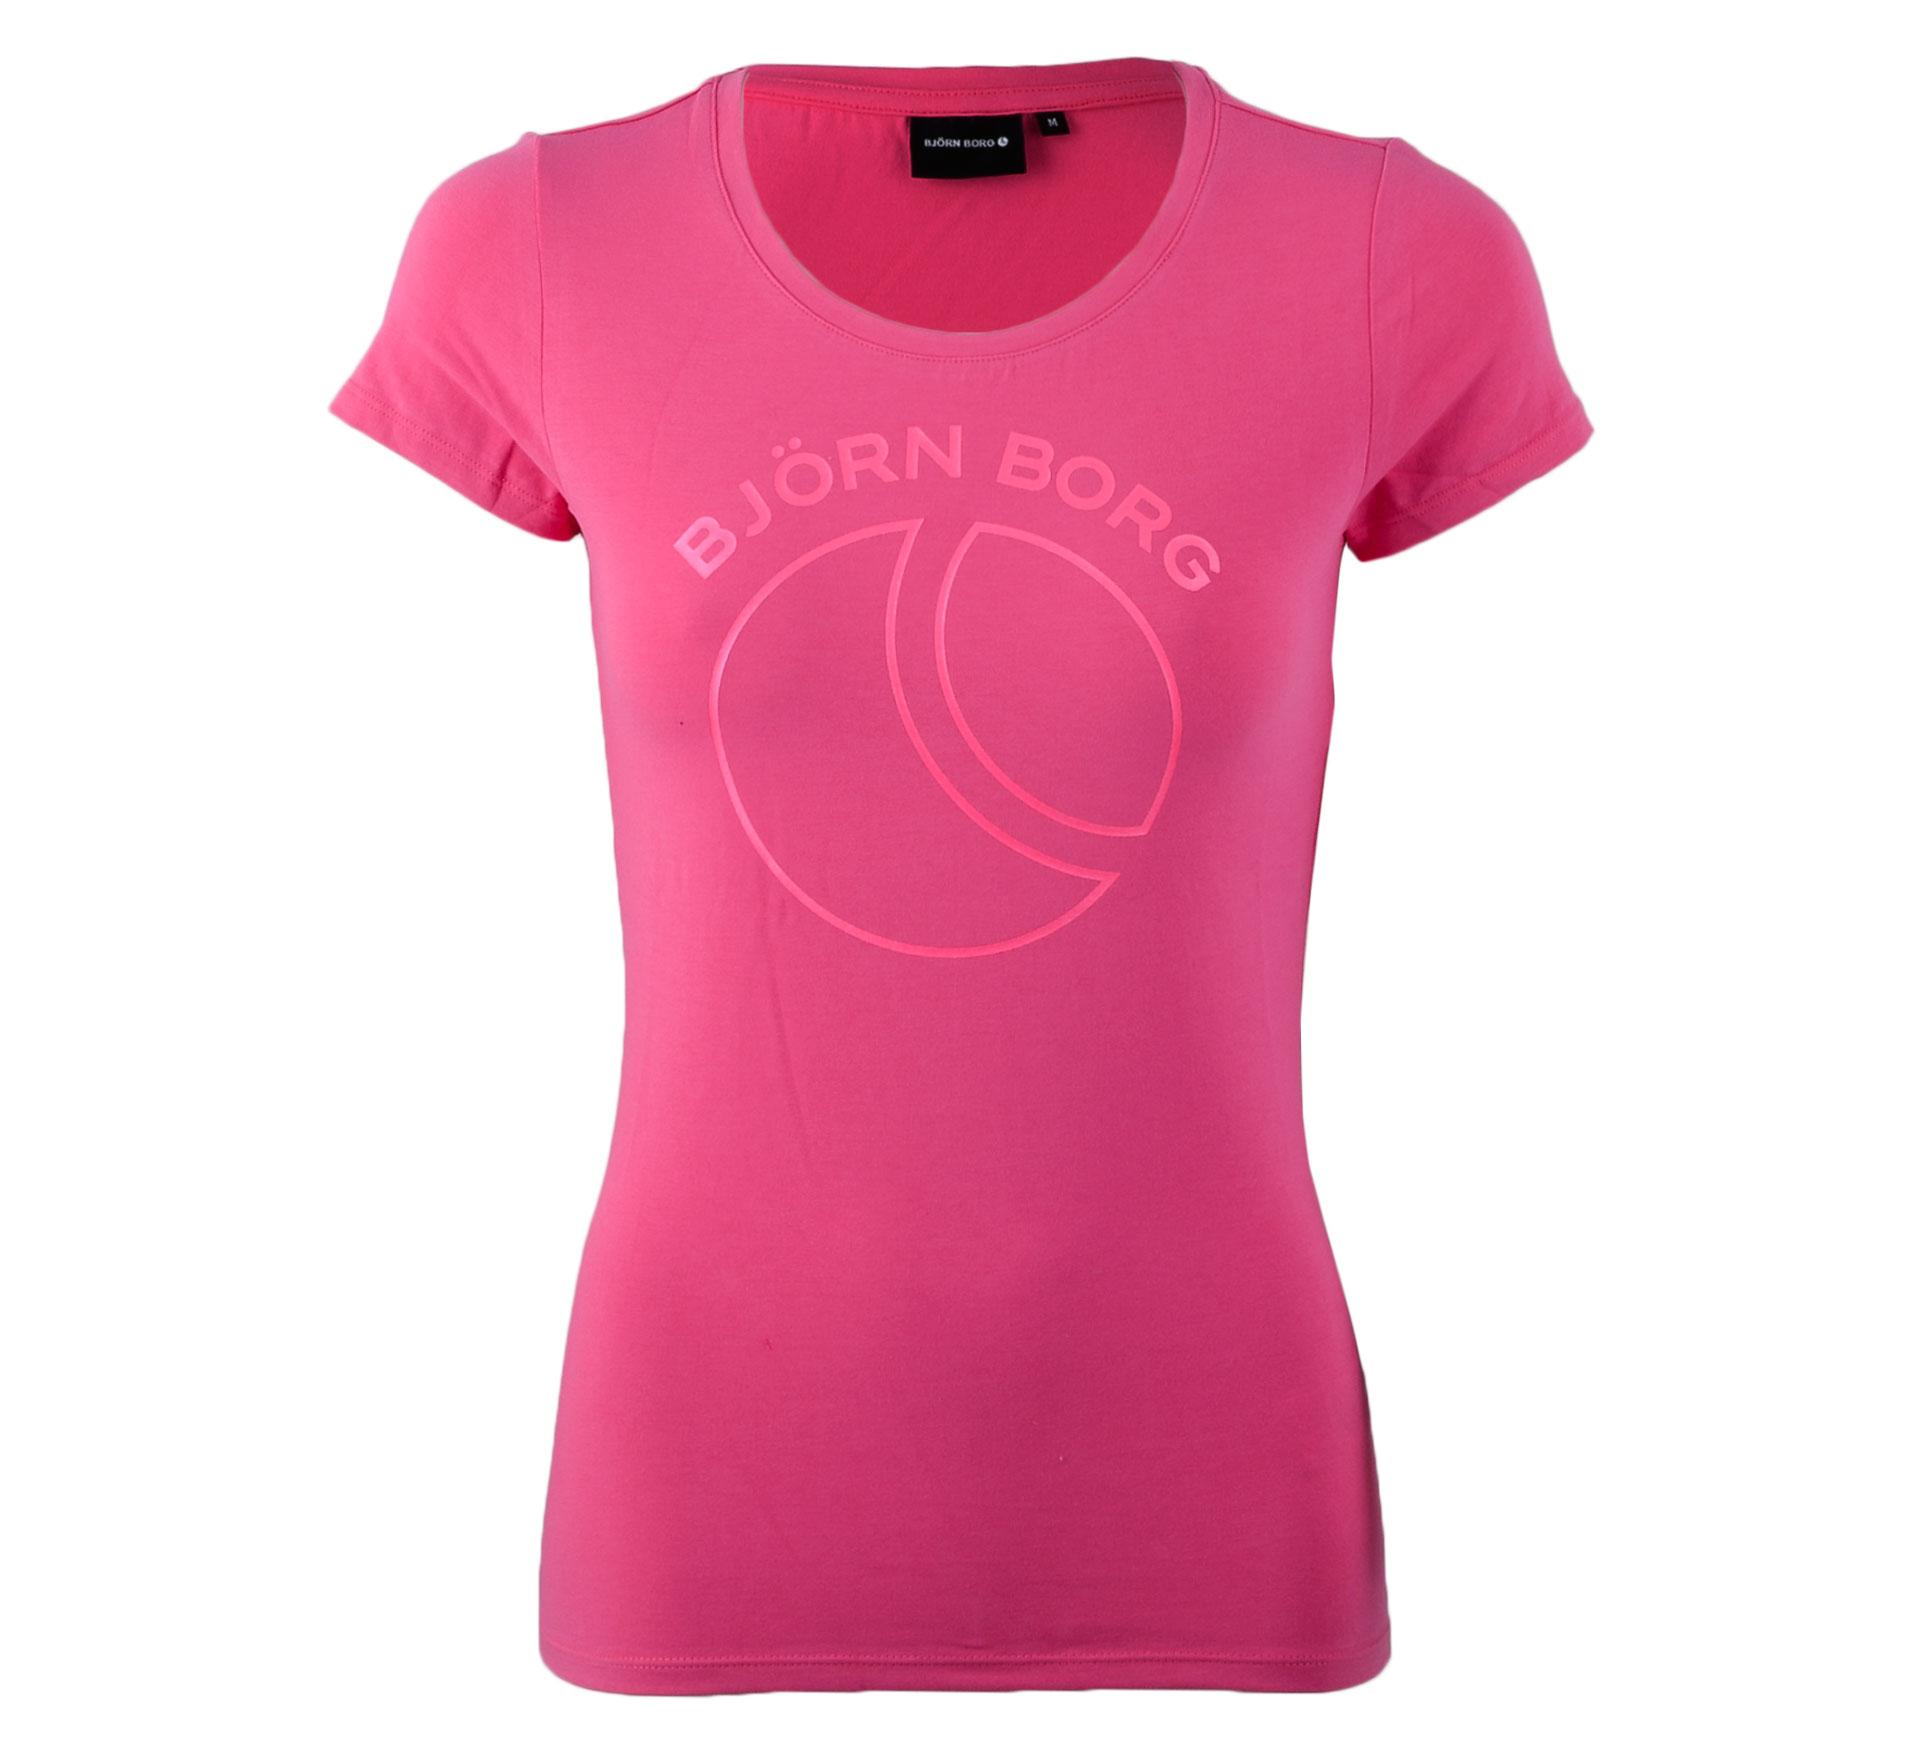 Bjorn Borg Björn Borg Mio T-shirt Dames roze